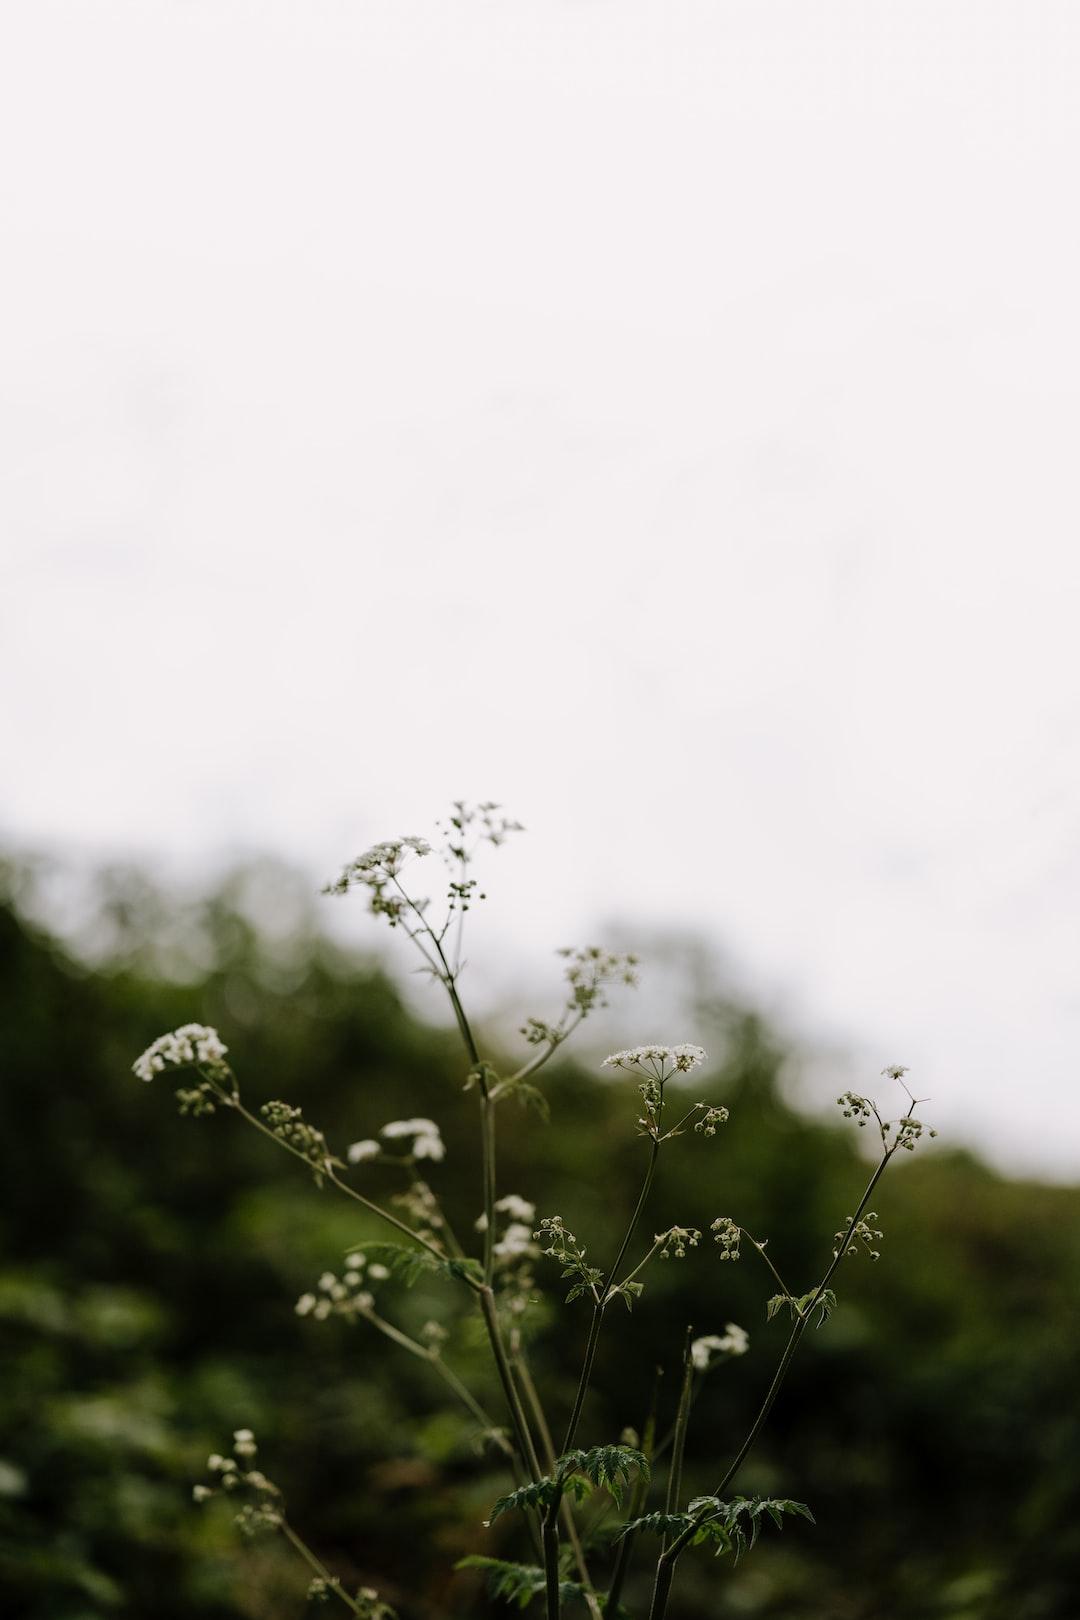 green plant under white sky during daytime